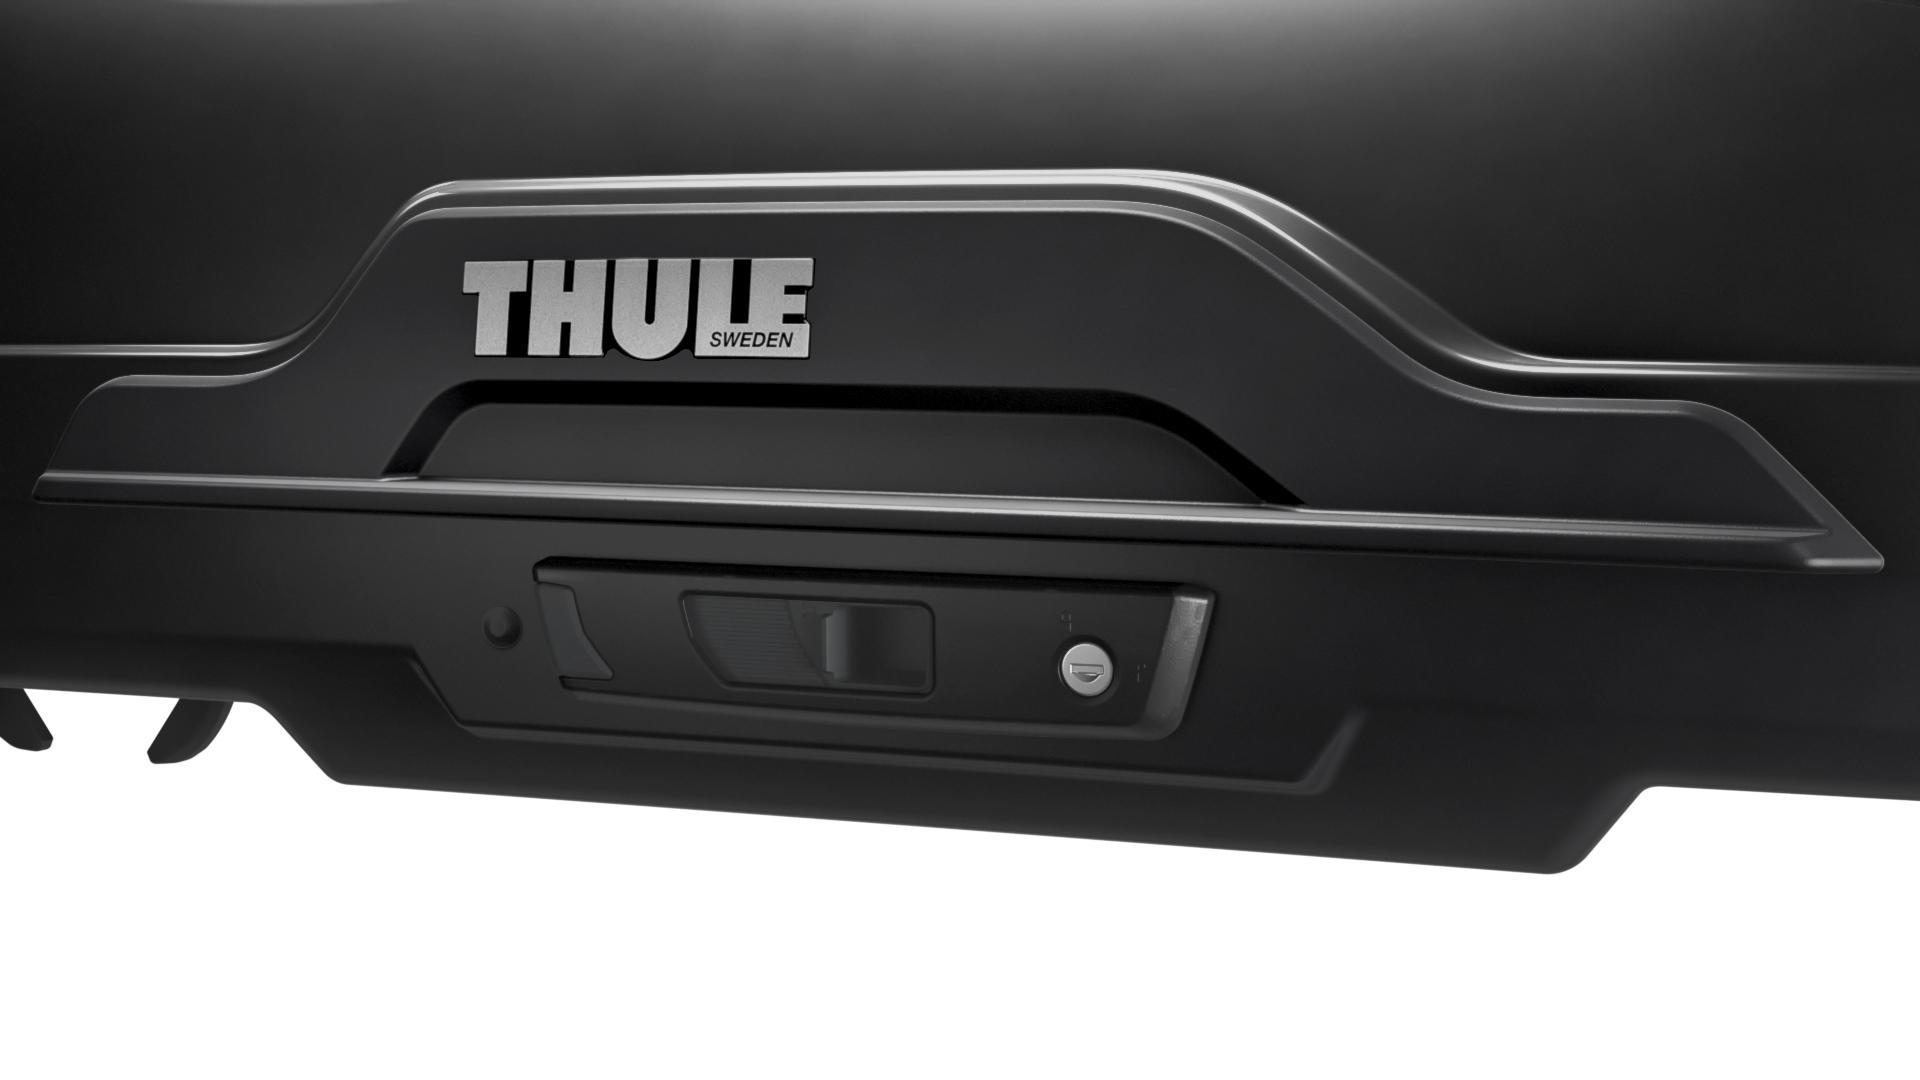 Thule_MotionXT_LockBar_F_ISO_629200_629600_629800_629900